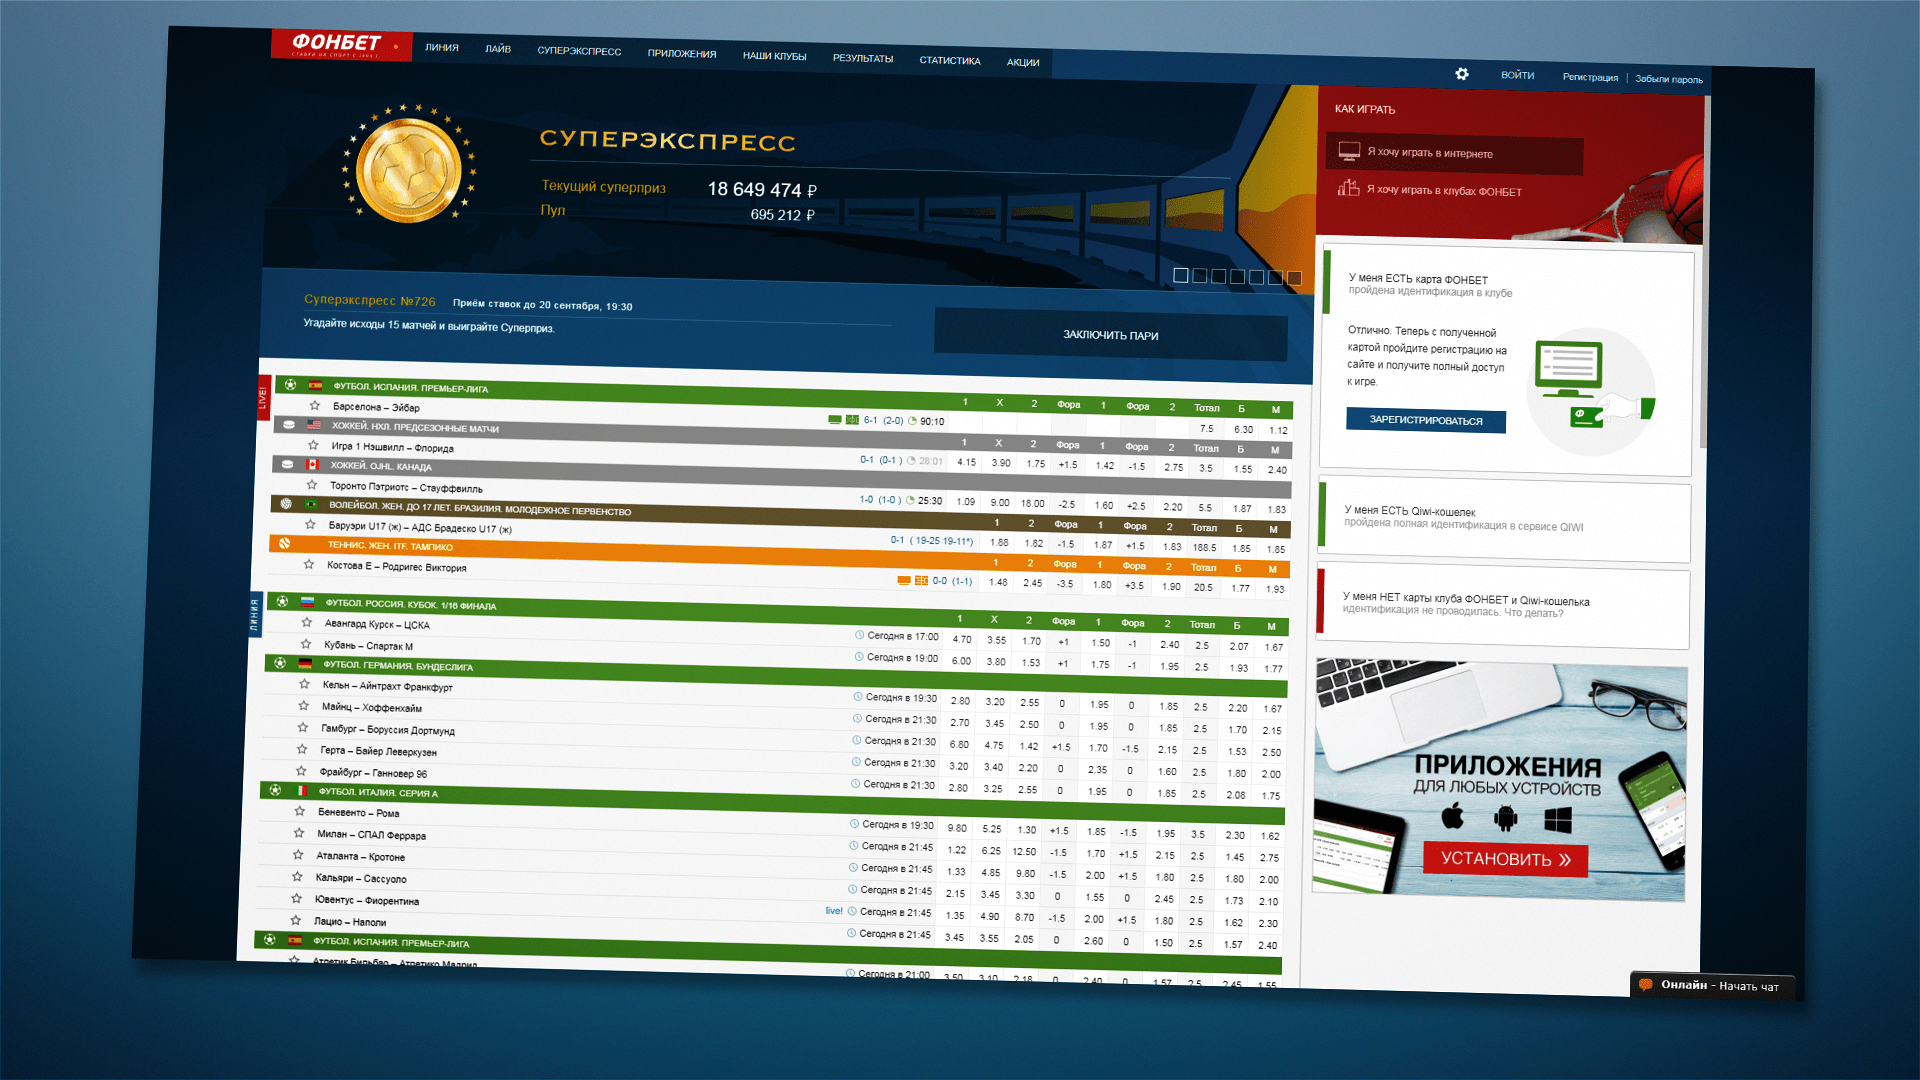 бк фонбет сайт